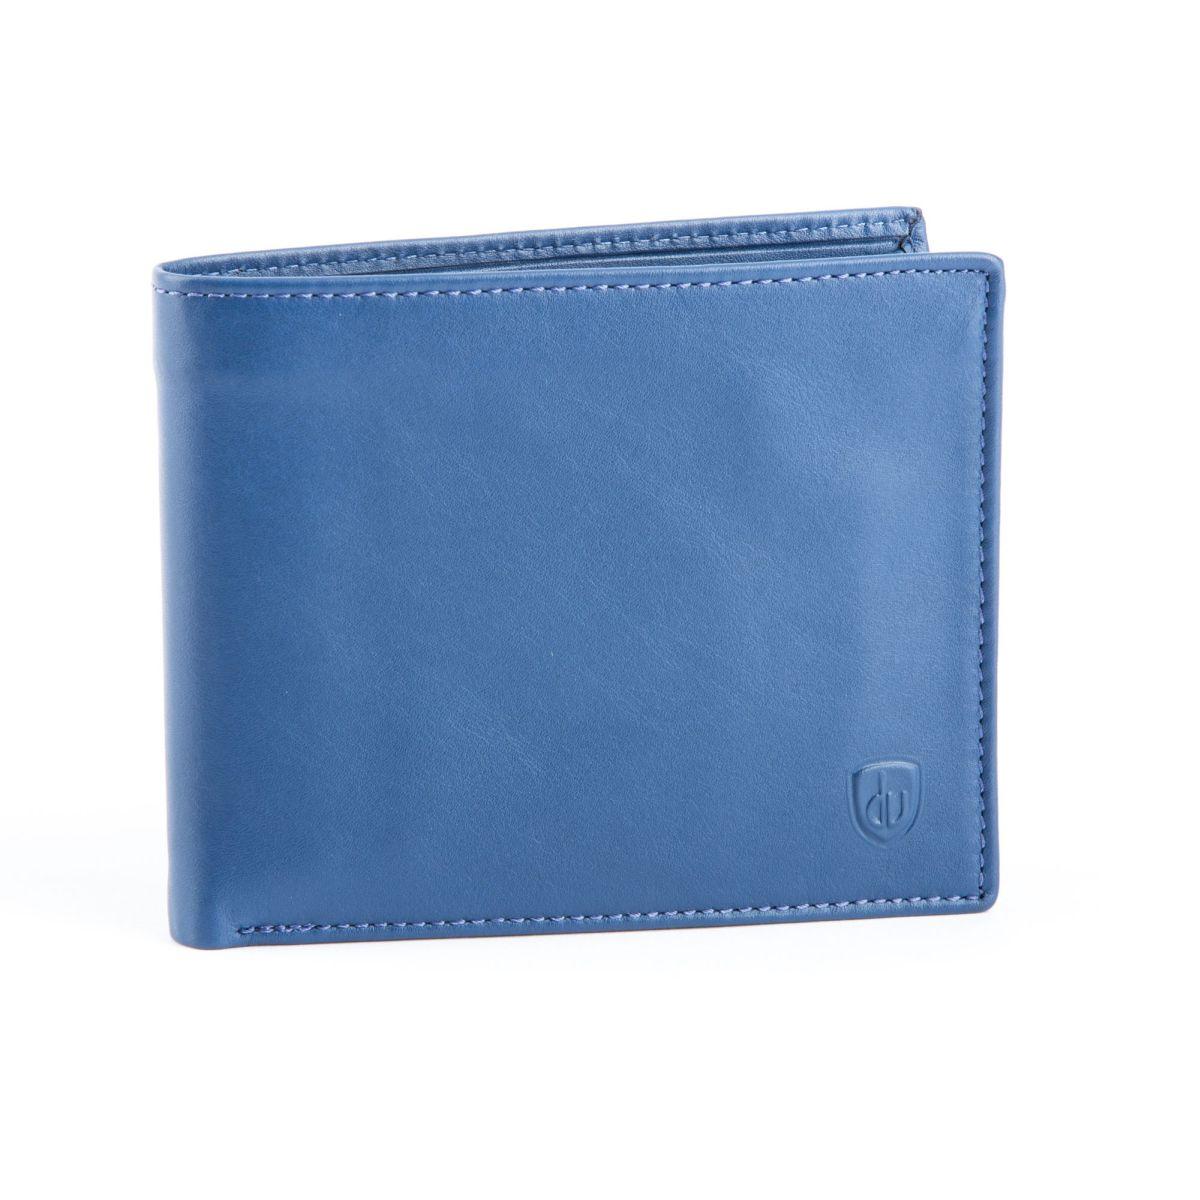 dv ארנק עור איכותי עם פתיחה כפולה - כחול